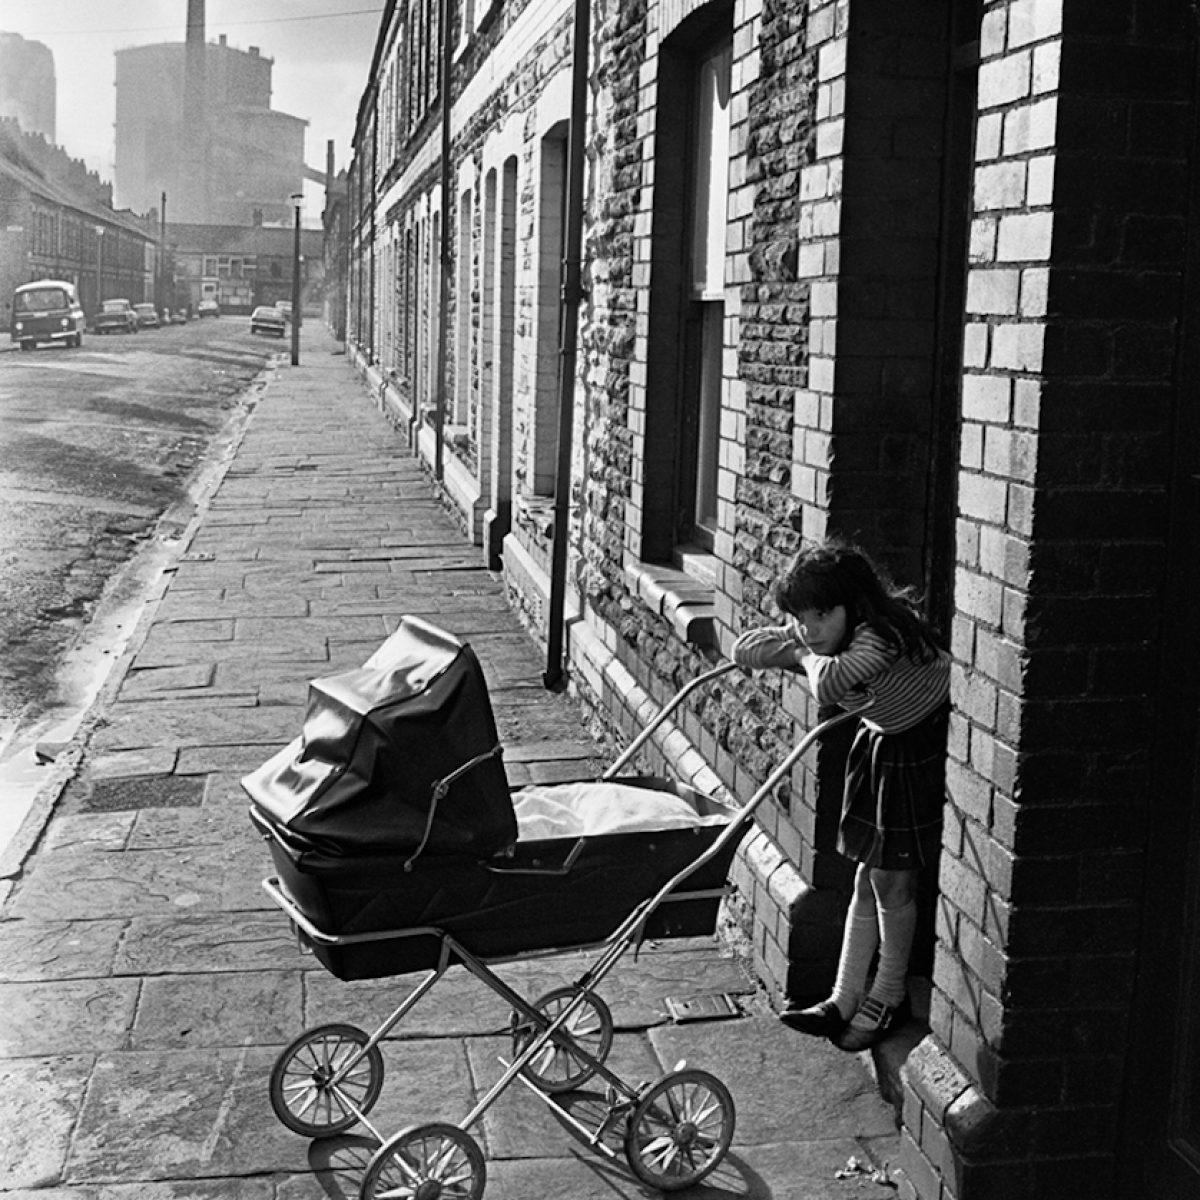 Splott, Cardiff, 1975